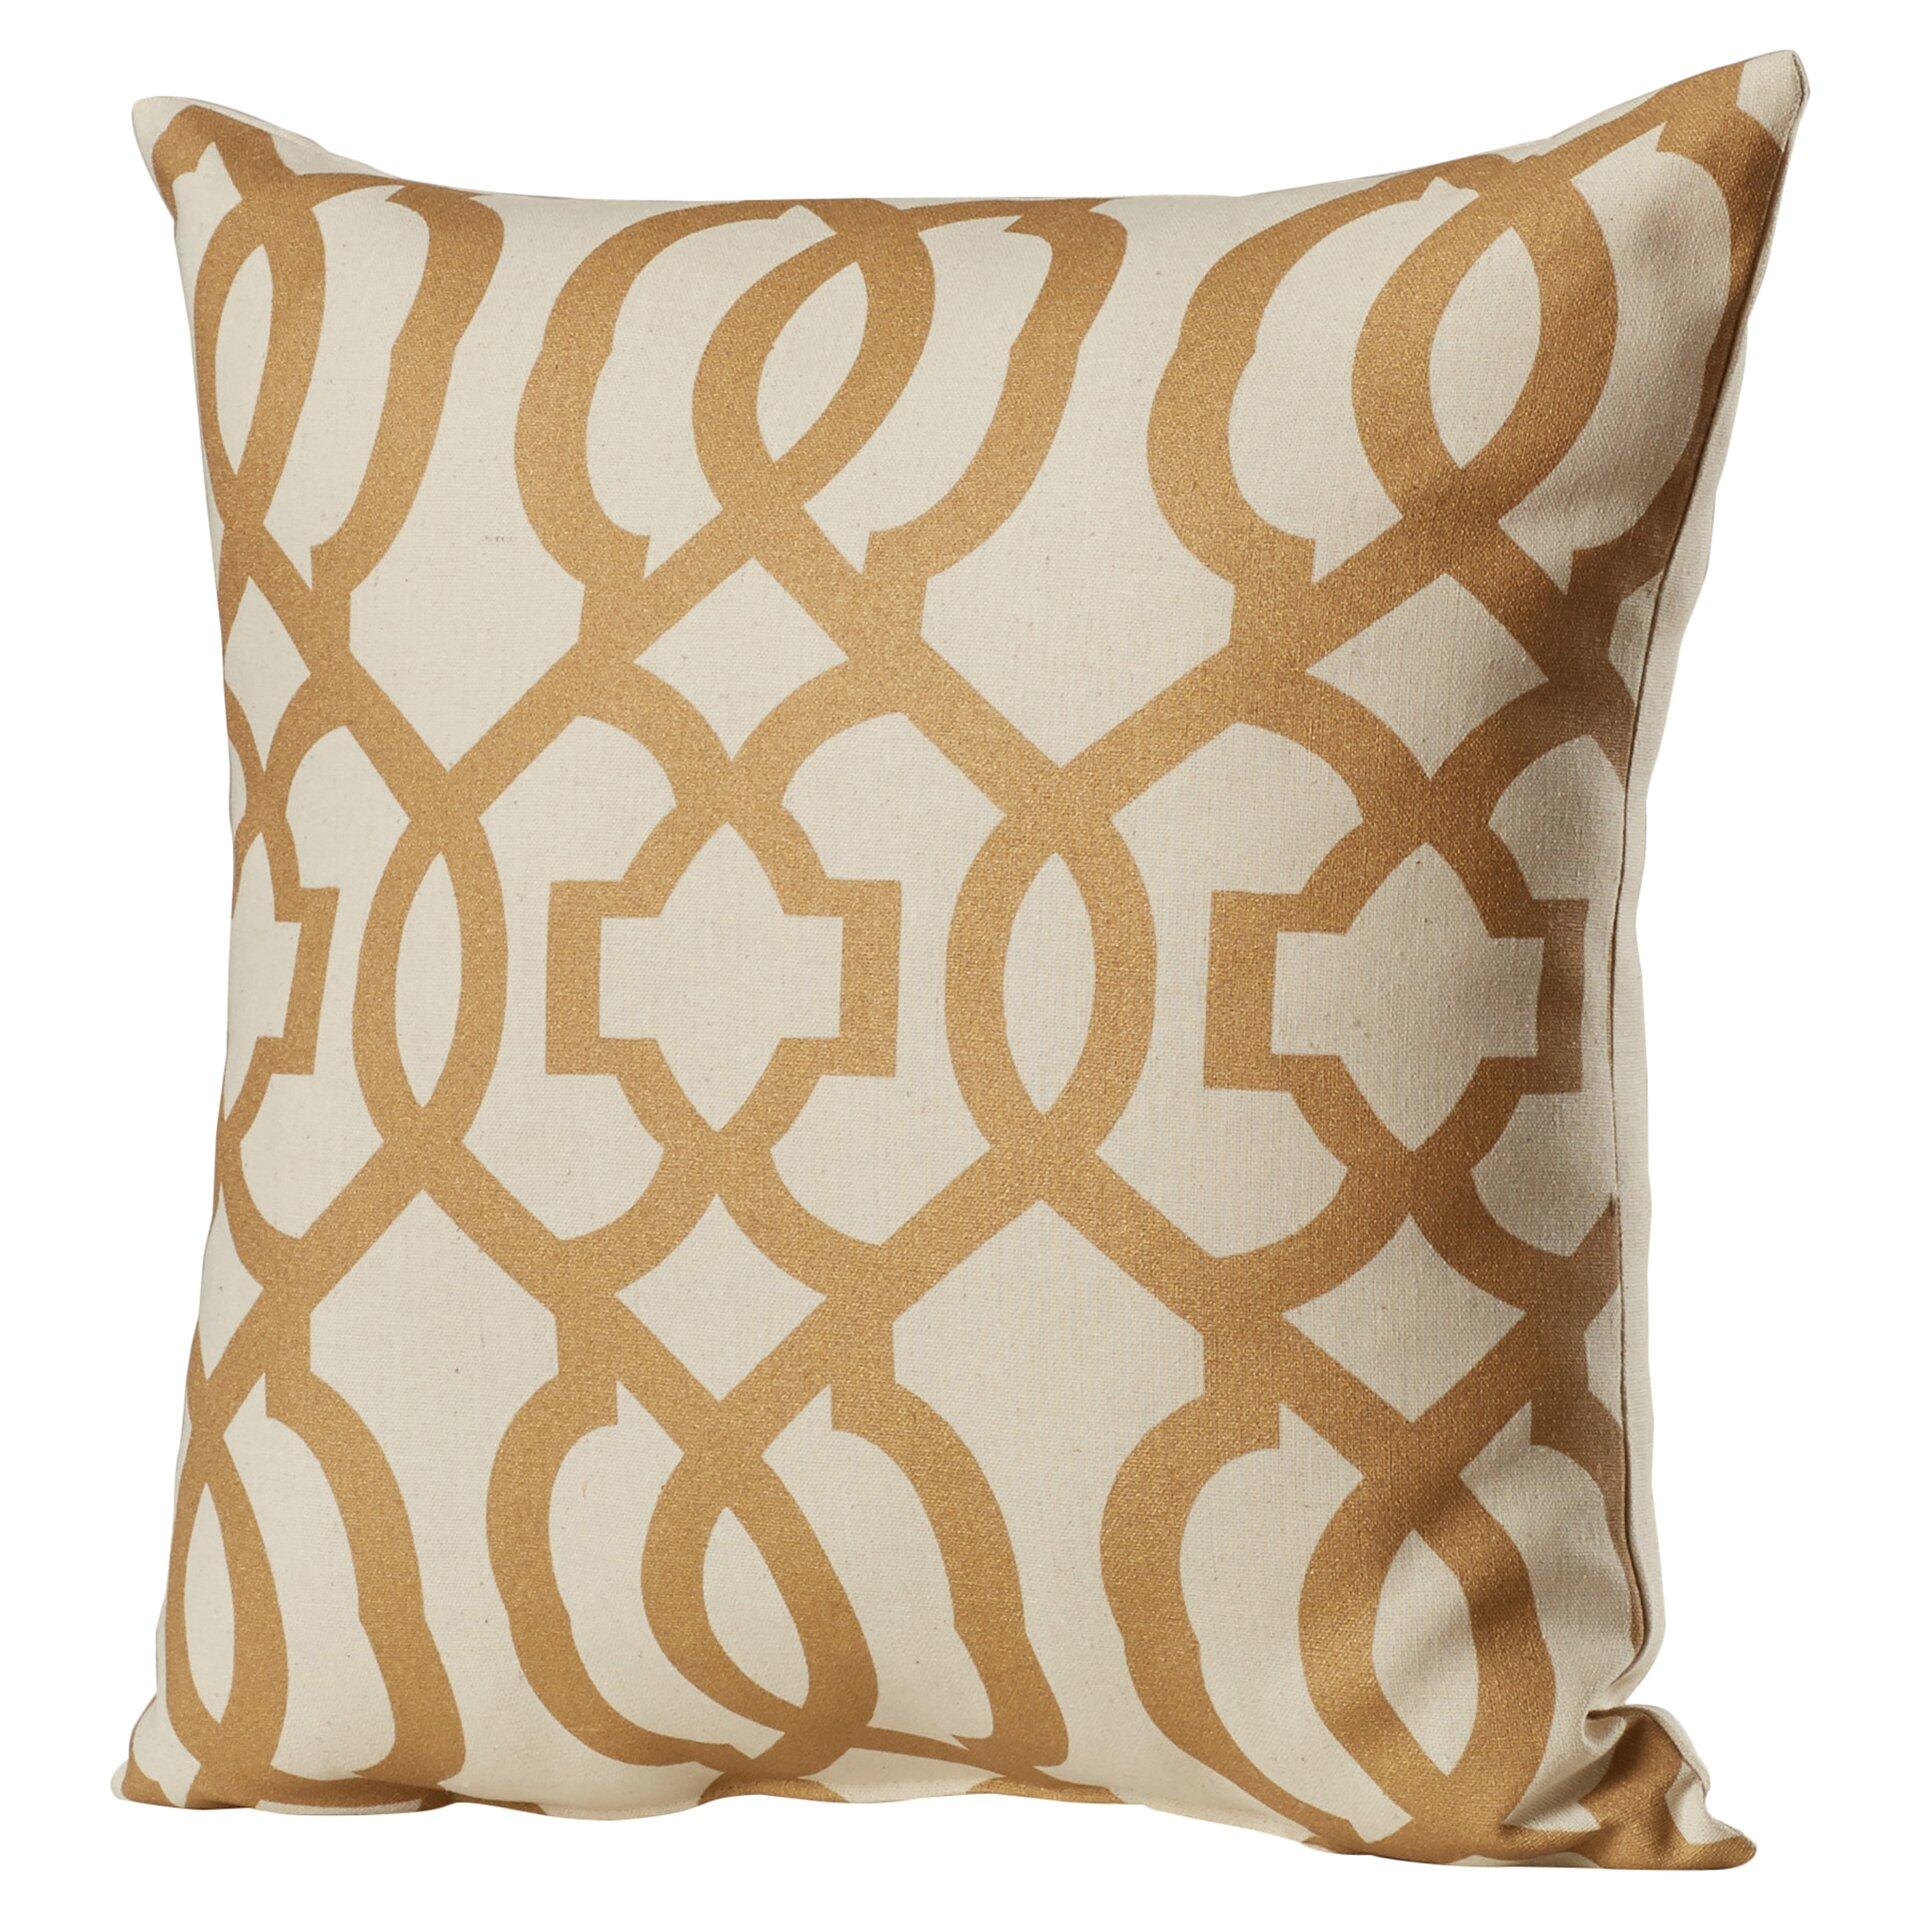 House of hampton ashford throw pillow reviews wayfair for Buy hampton inn pillows